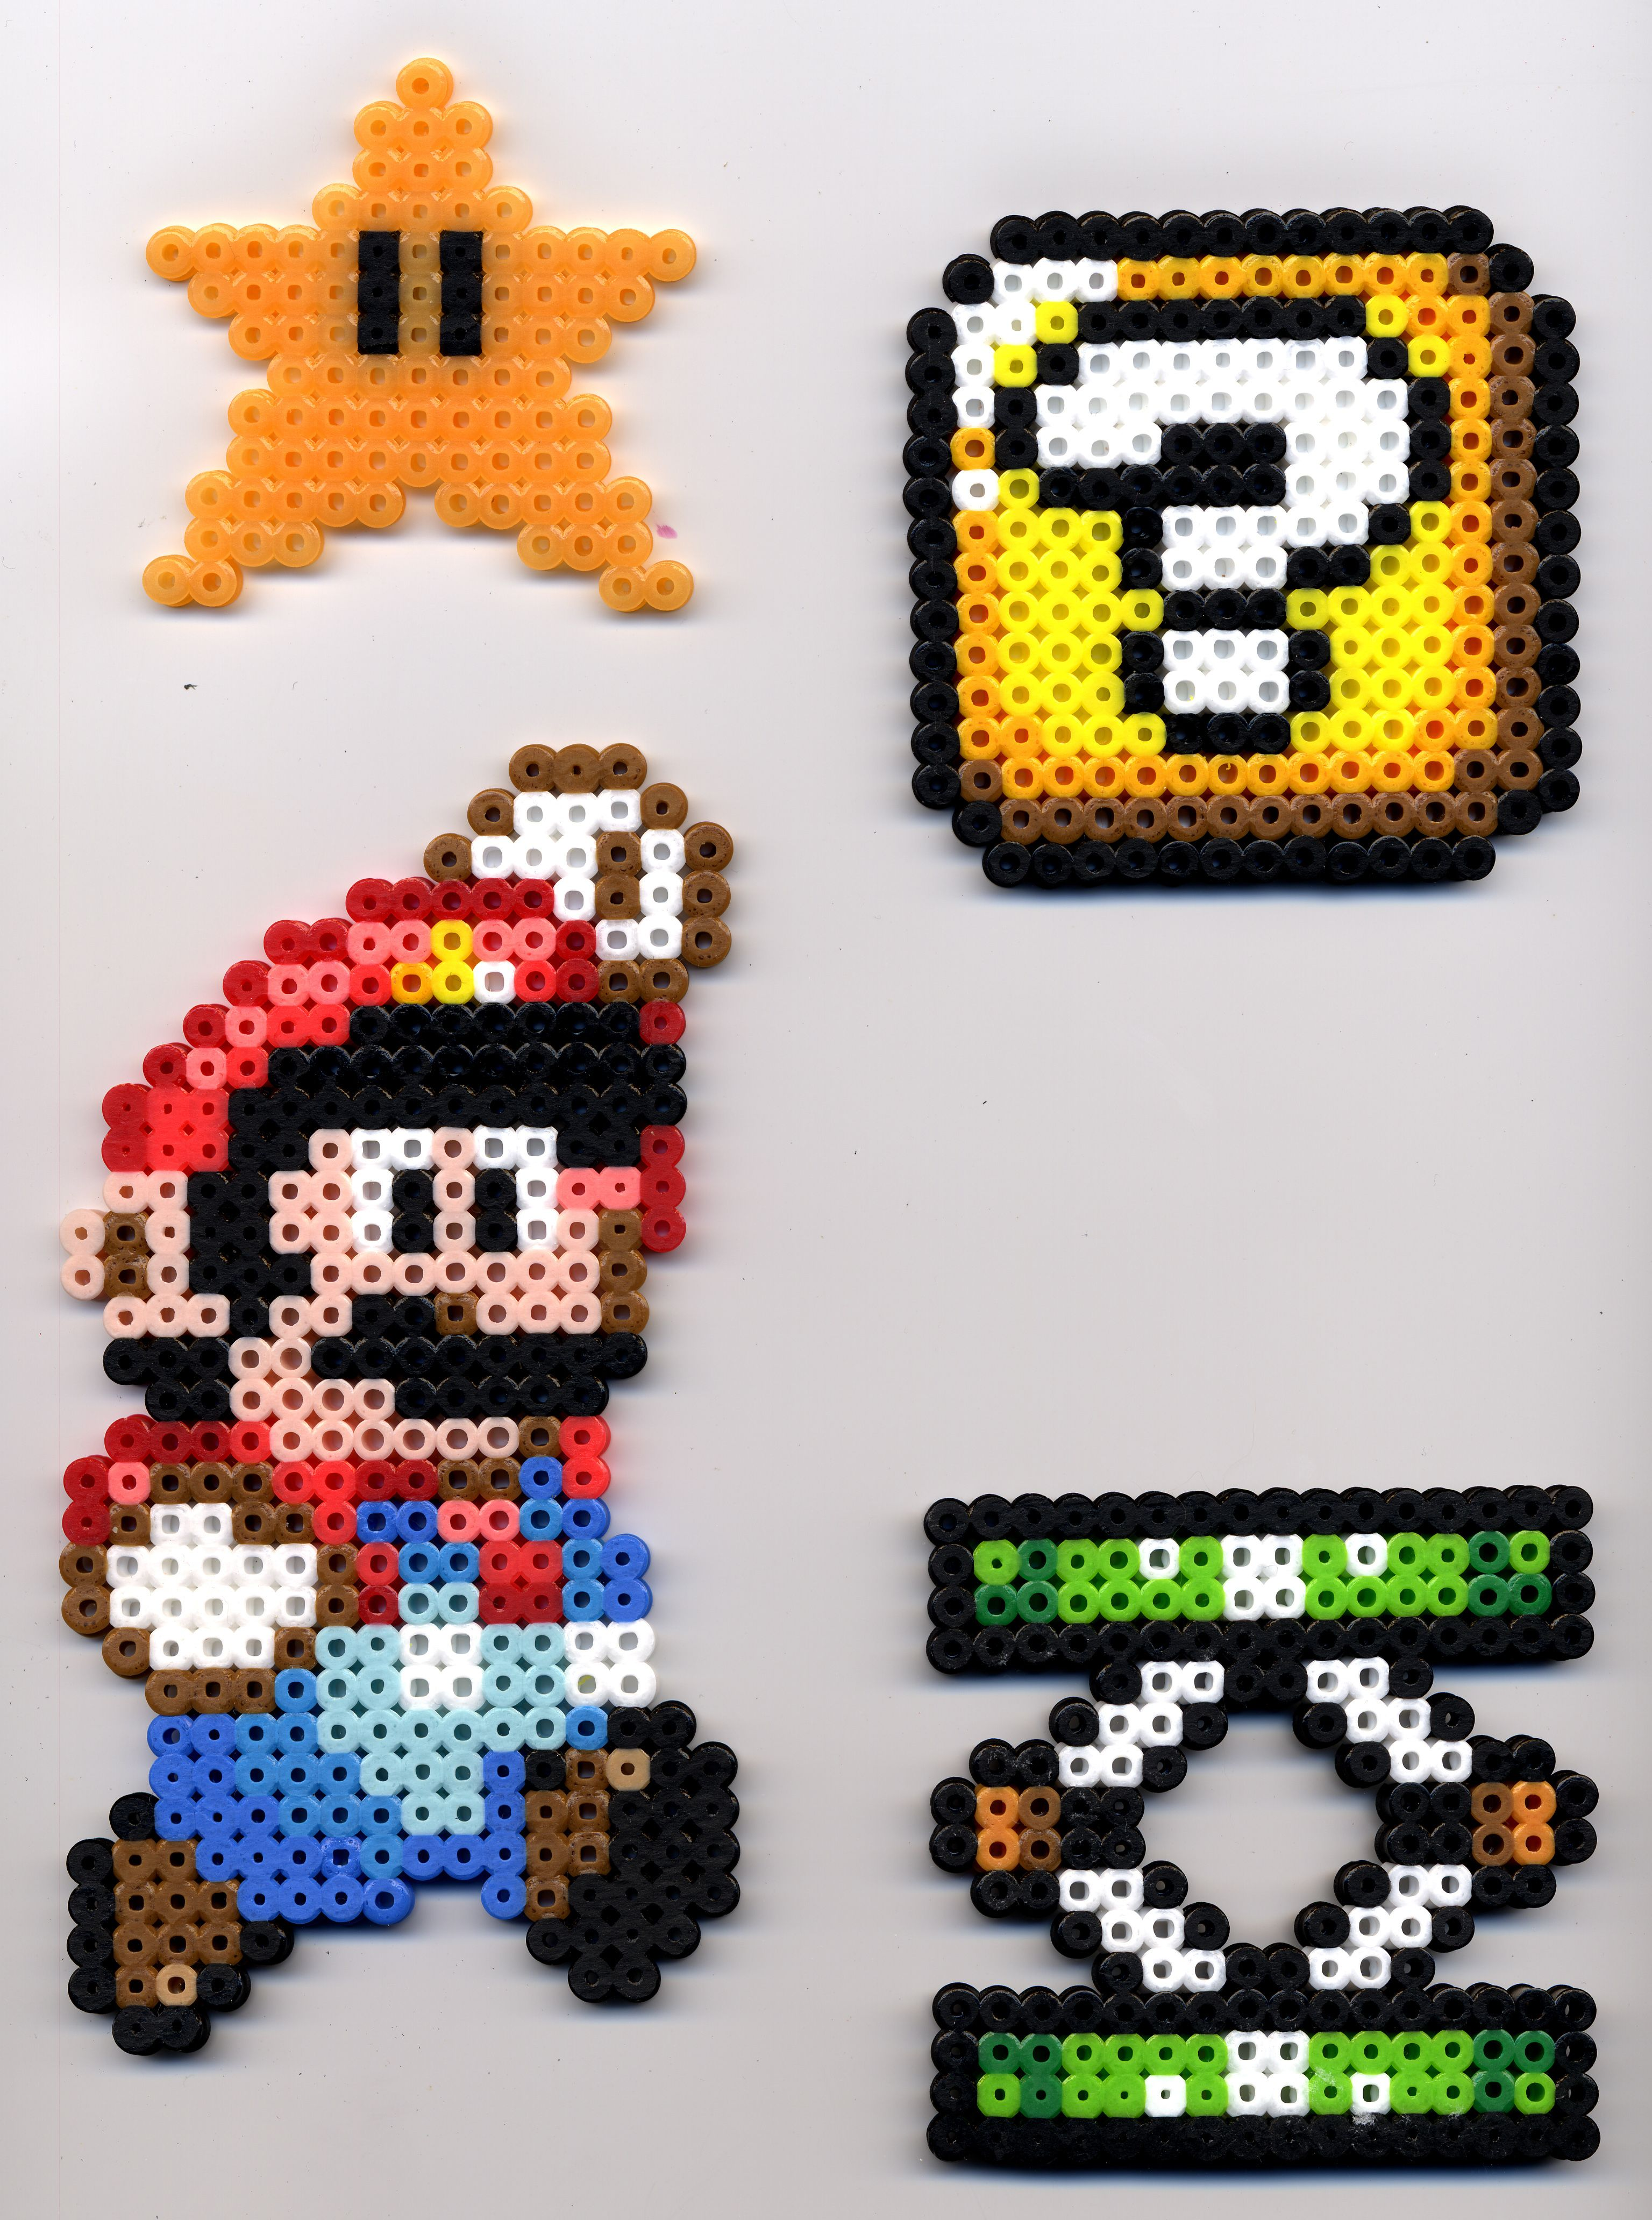 Mario Etc In Perler Beads By Bluekecleon15 On Deviantart